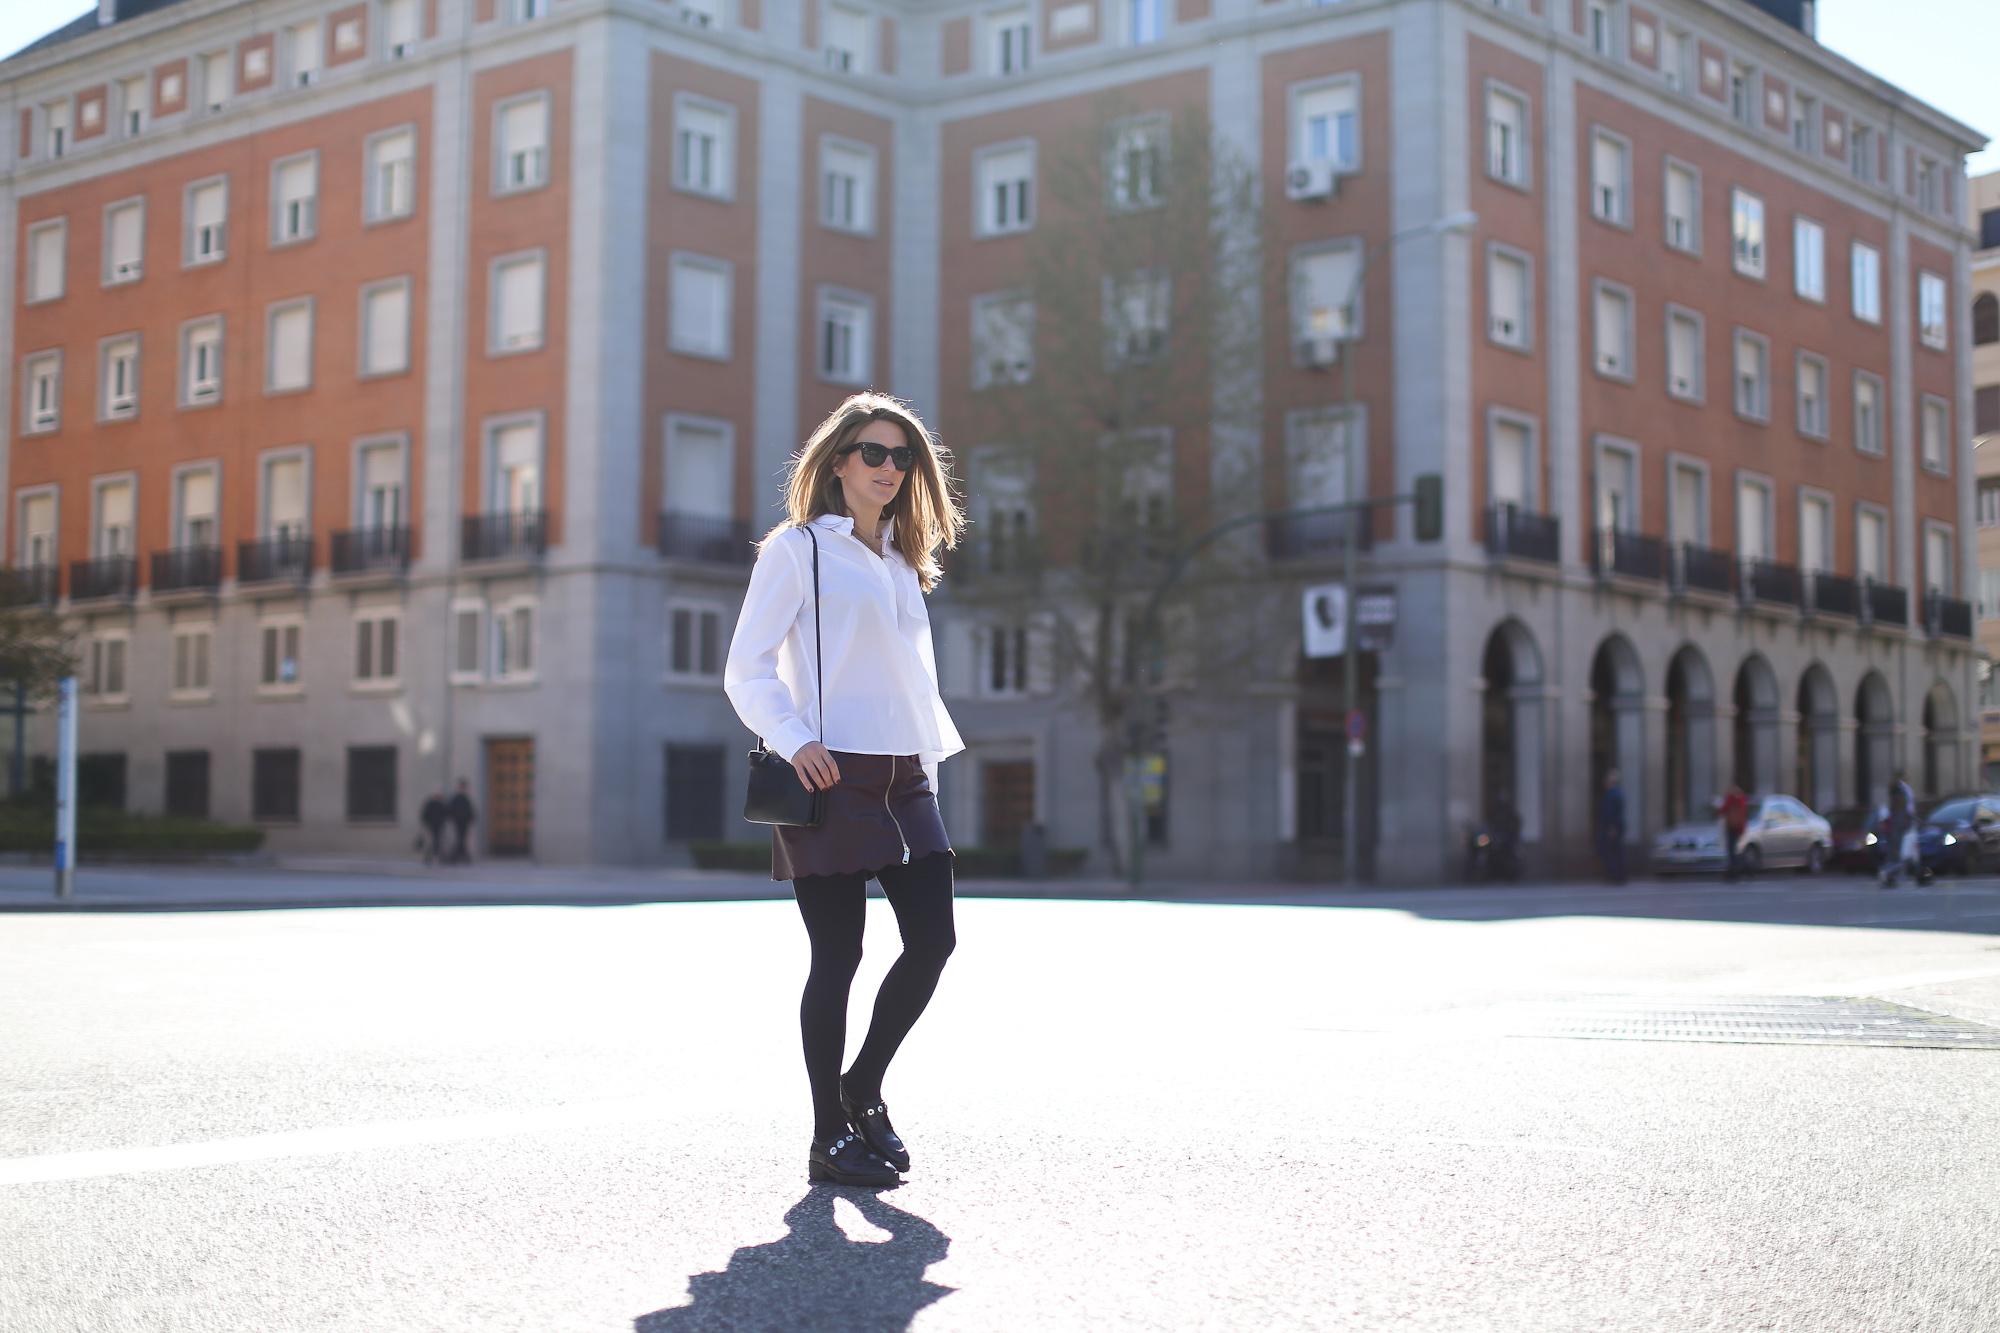 Clochet_streetstyle_maxandCo_leatherminiskirt_h&mtrend_blouse_sandroparis-brogues-3